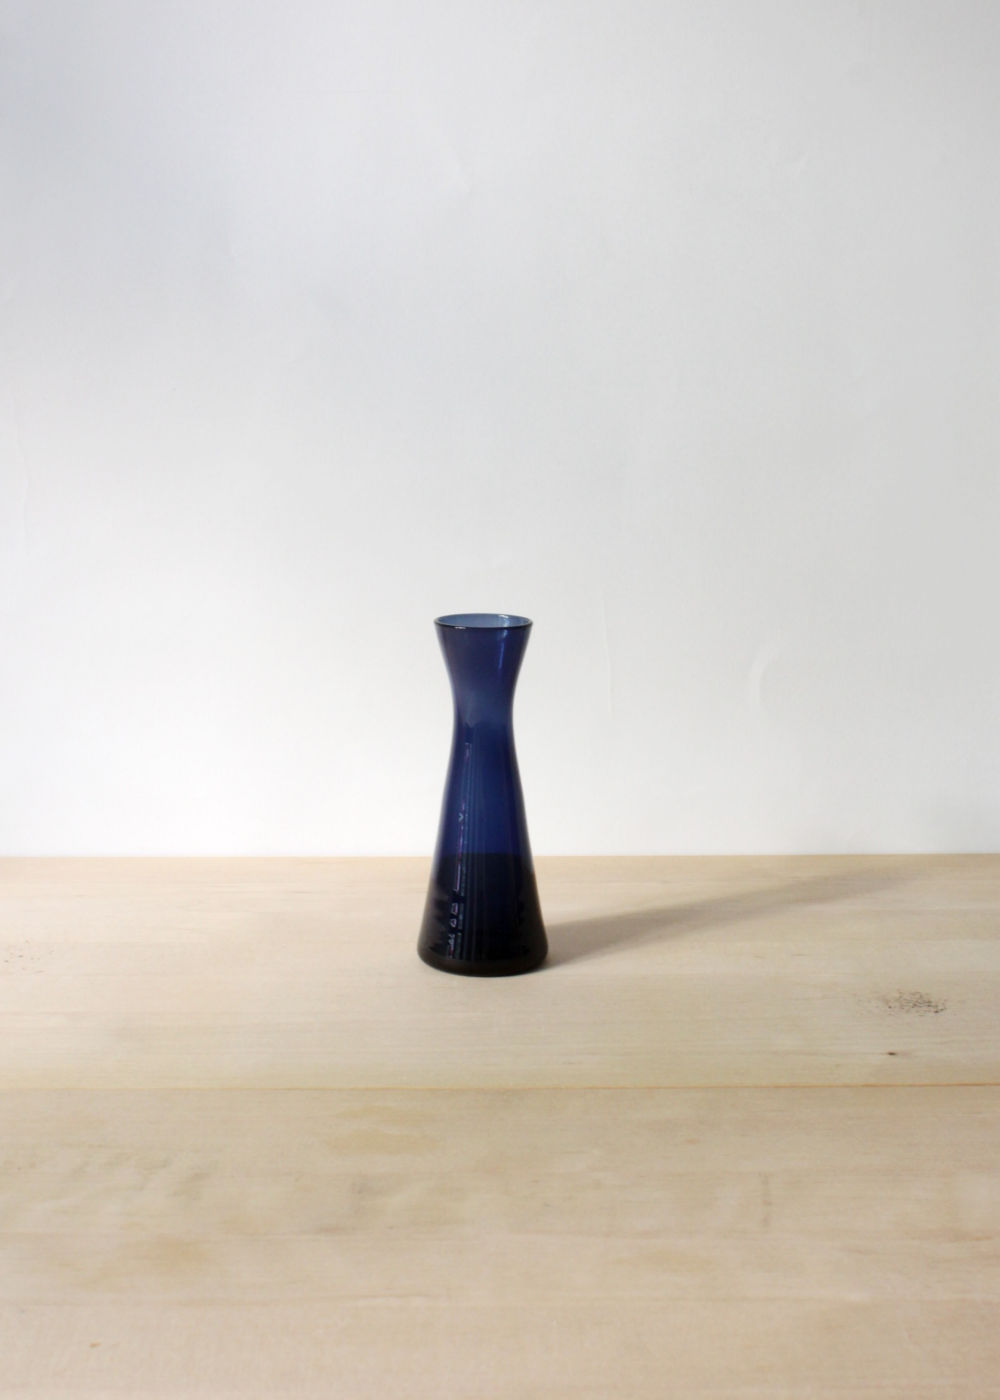 Kaj-Franck-glass-vase-small-blue-01